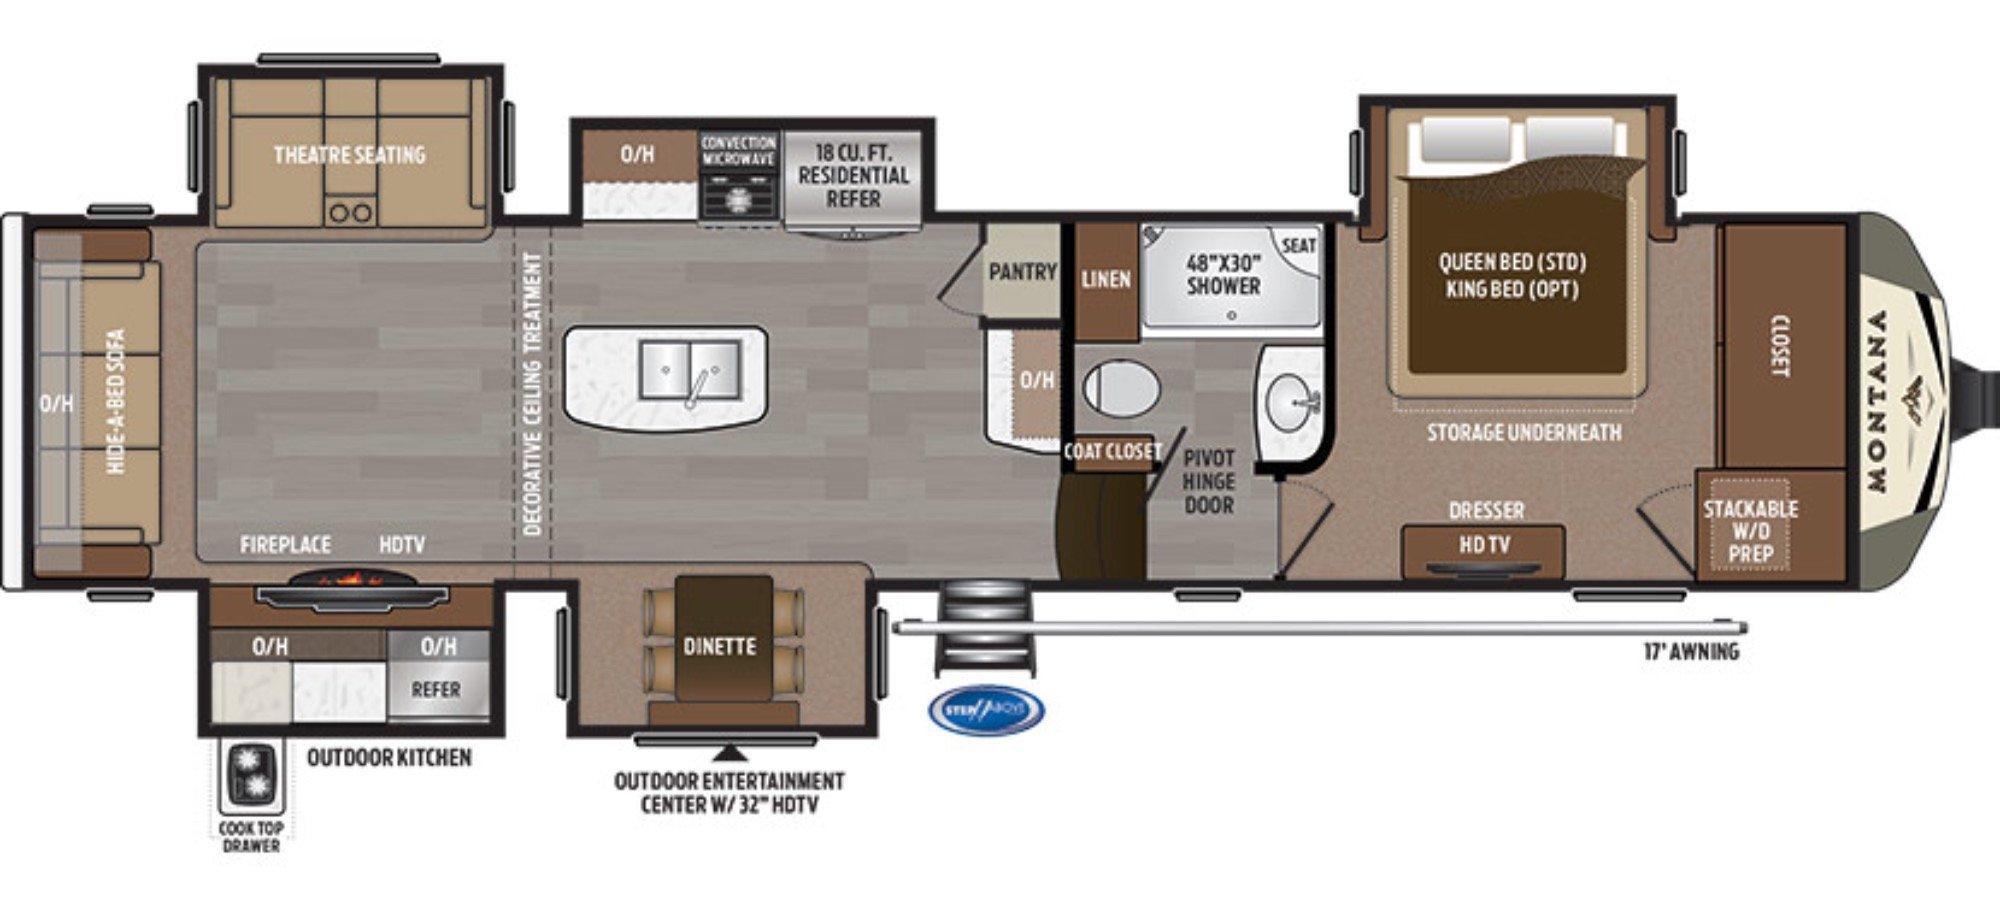 View Floor Plan for 2018 KEYSTONE MONTANA 3661RL